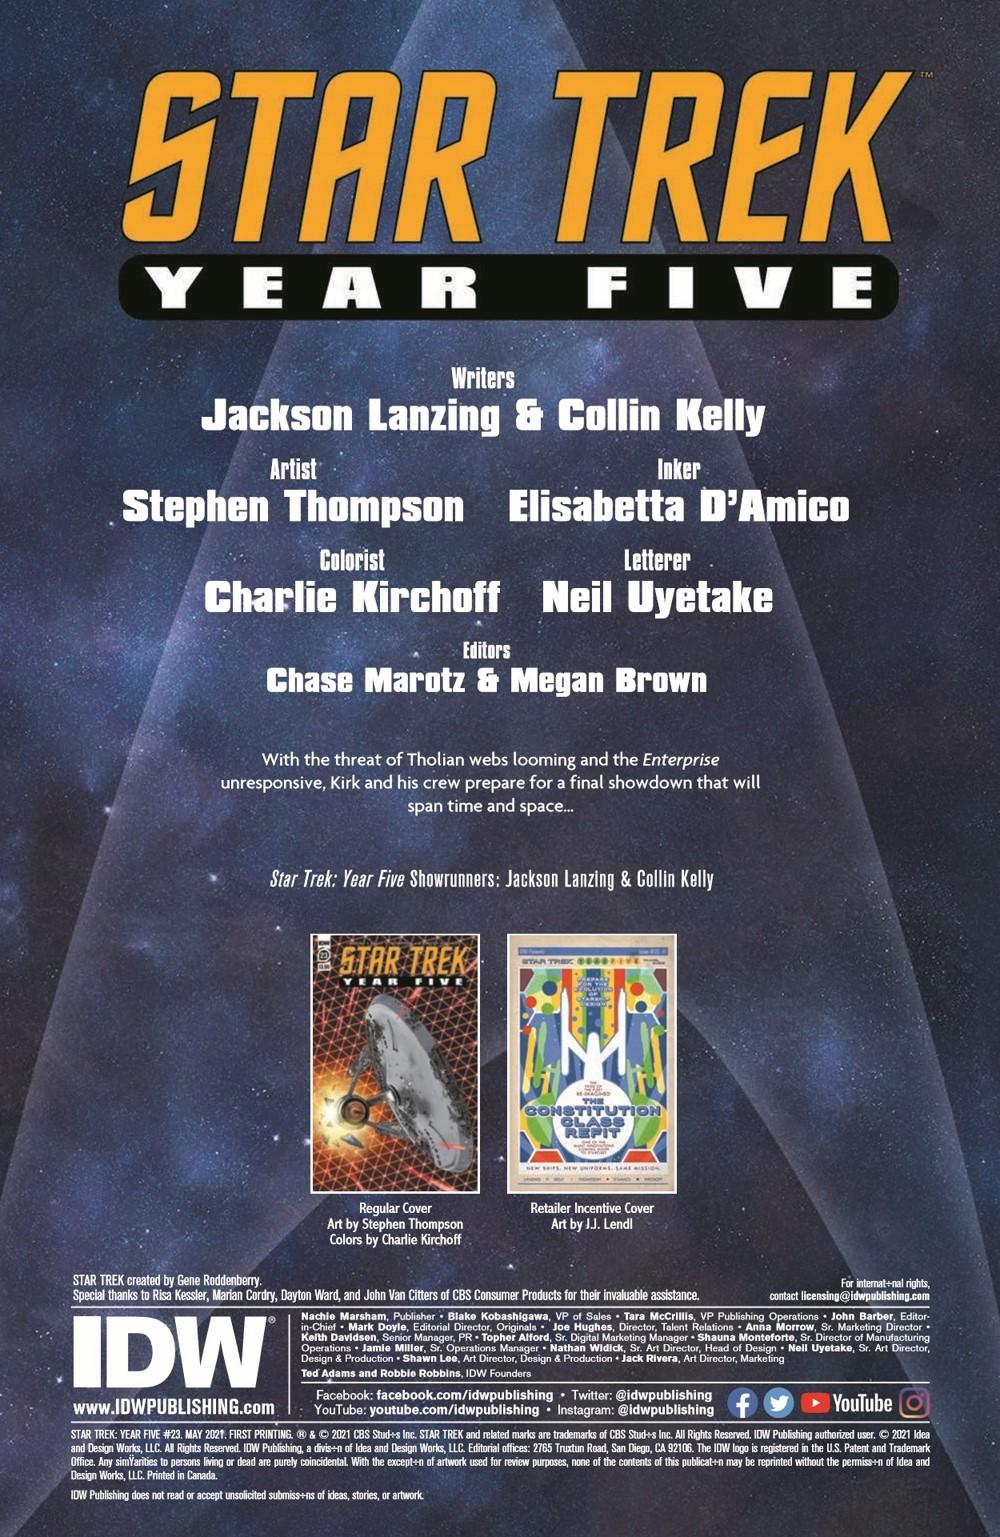 ST_YearFive23-pr-2 ComicList Previews: STAR TREK YEAR FIVE #23